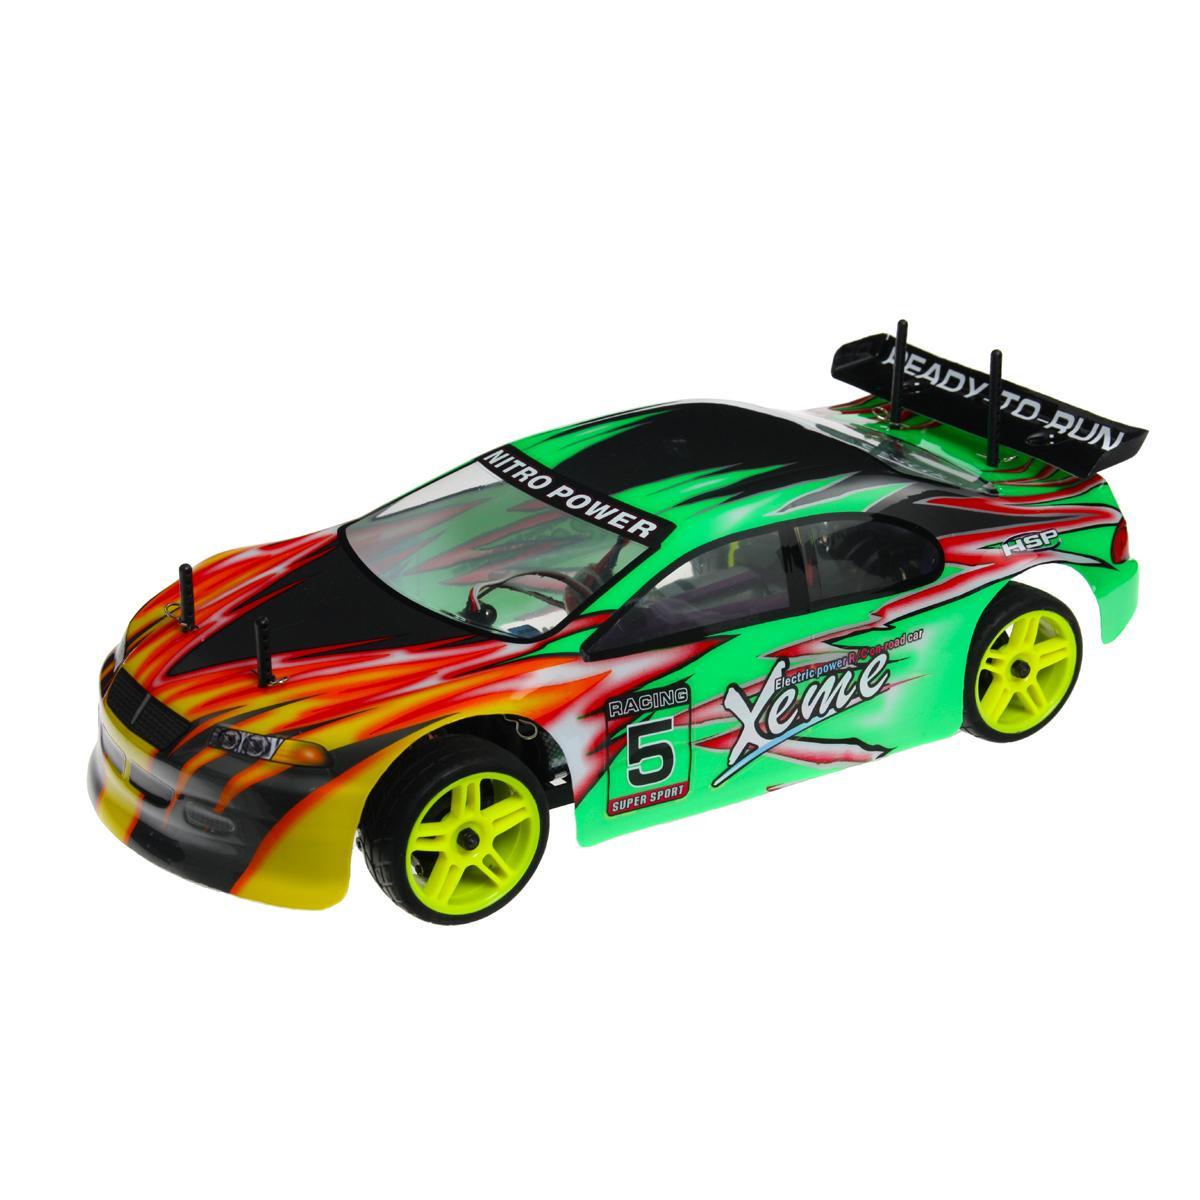 94103 Xeme Super Motive 1/10 Scale 4wd Racing Car 1